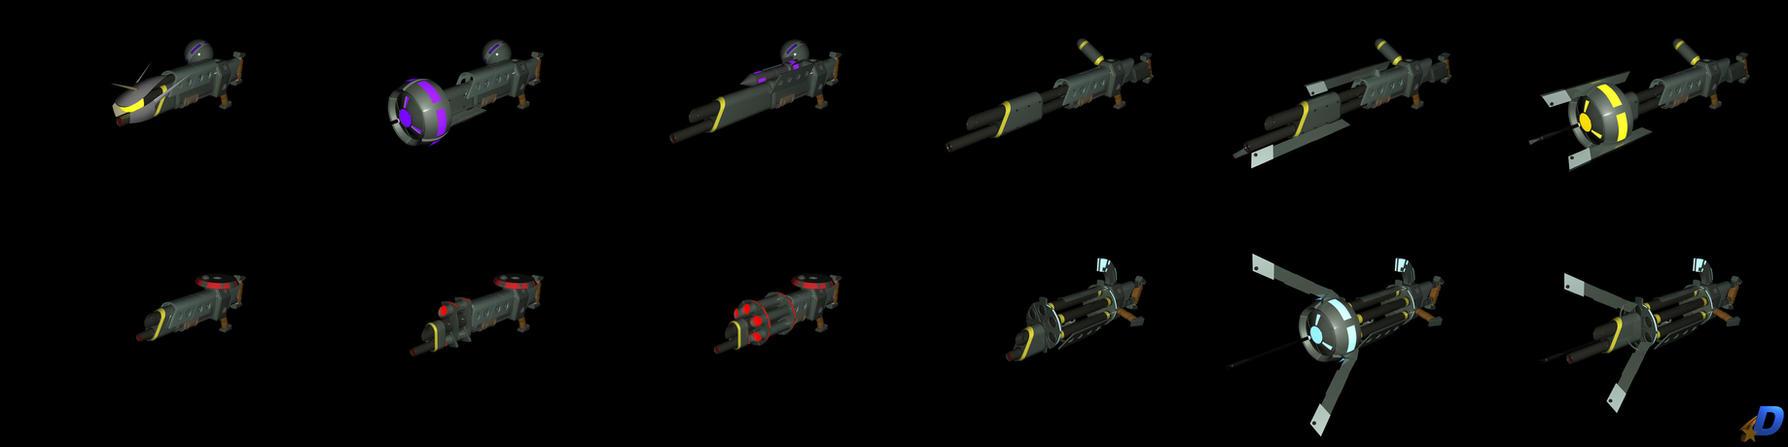 Morph Guns by Dave-Mastor